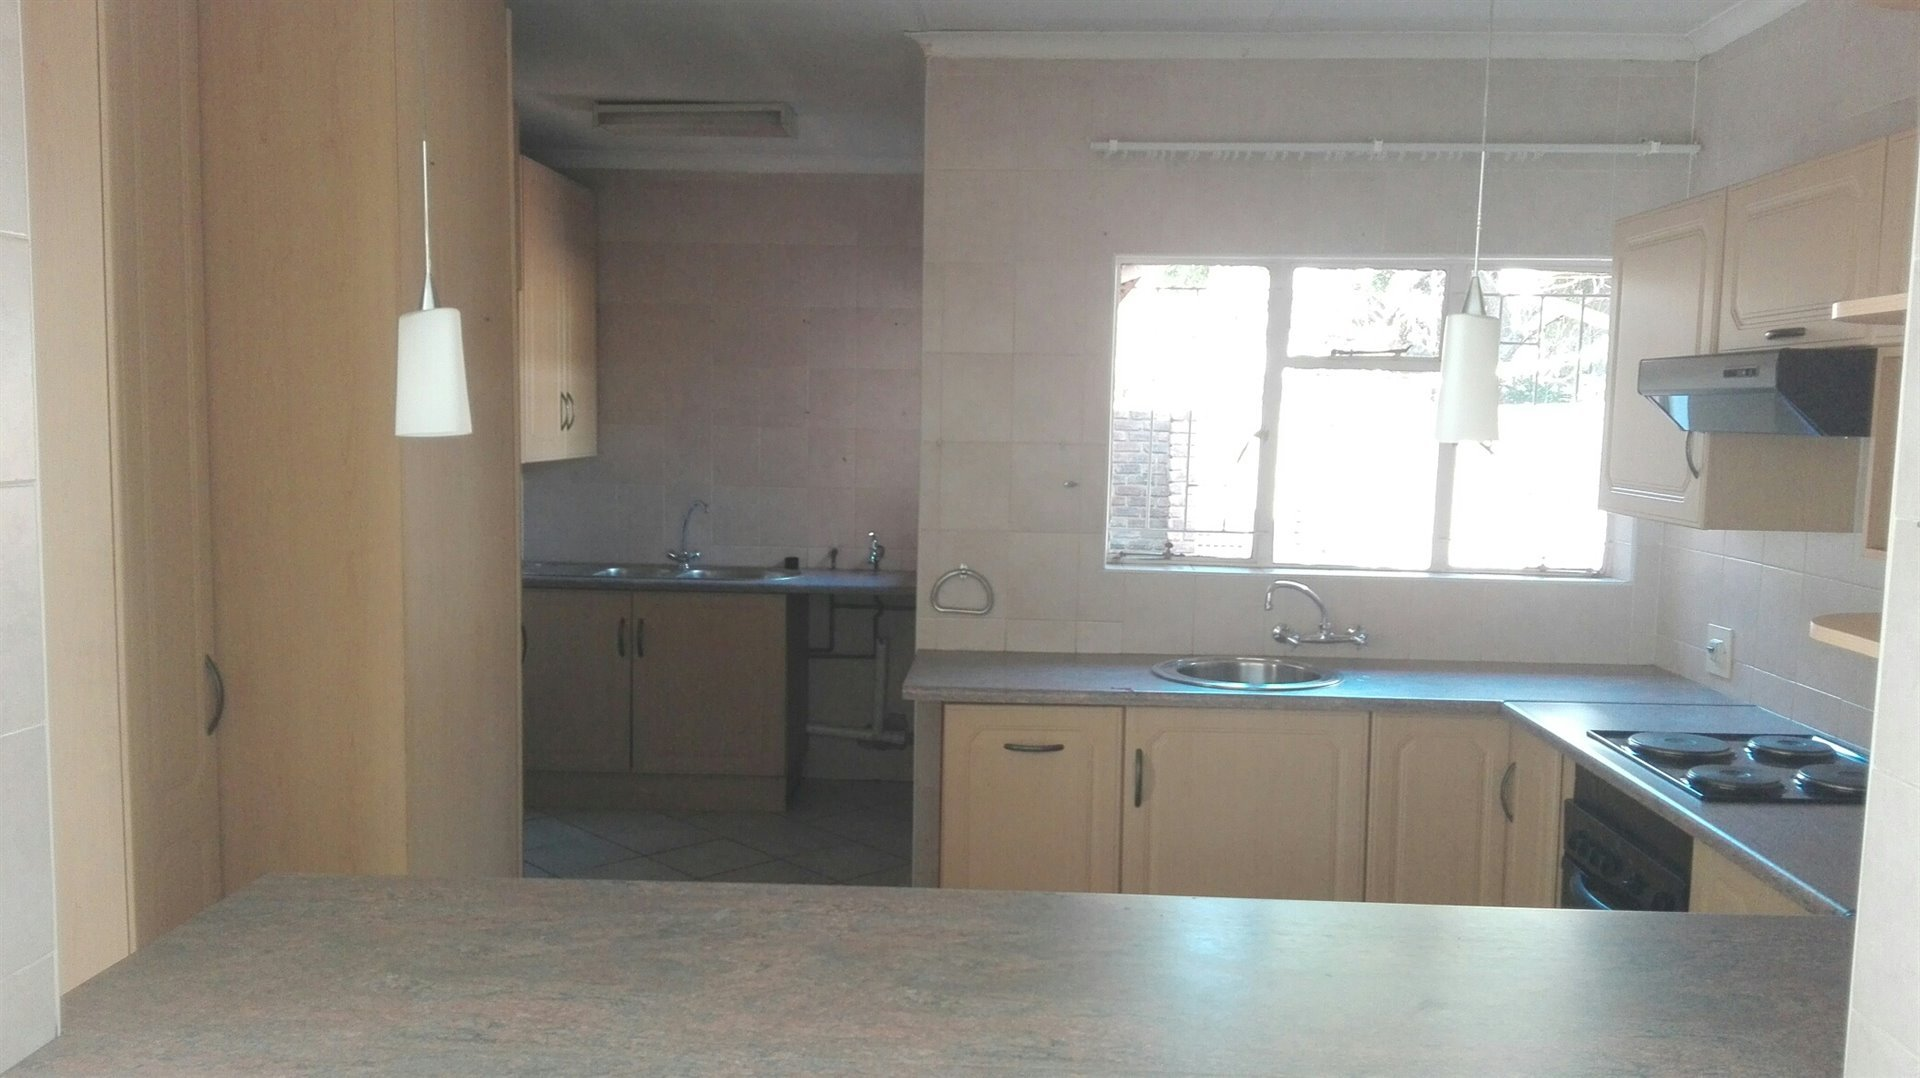 Zwartkop property for sale. Ref No: 13508772. Picture no 10